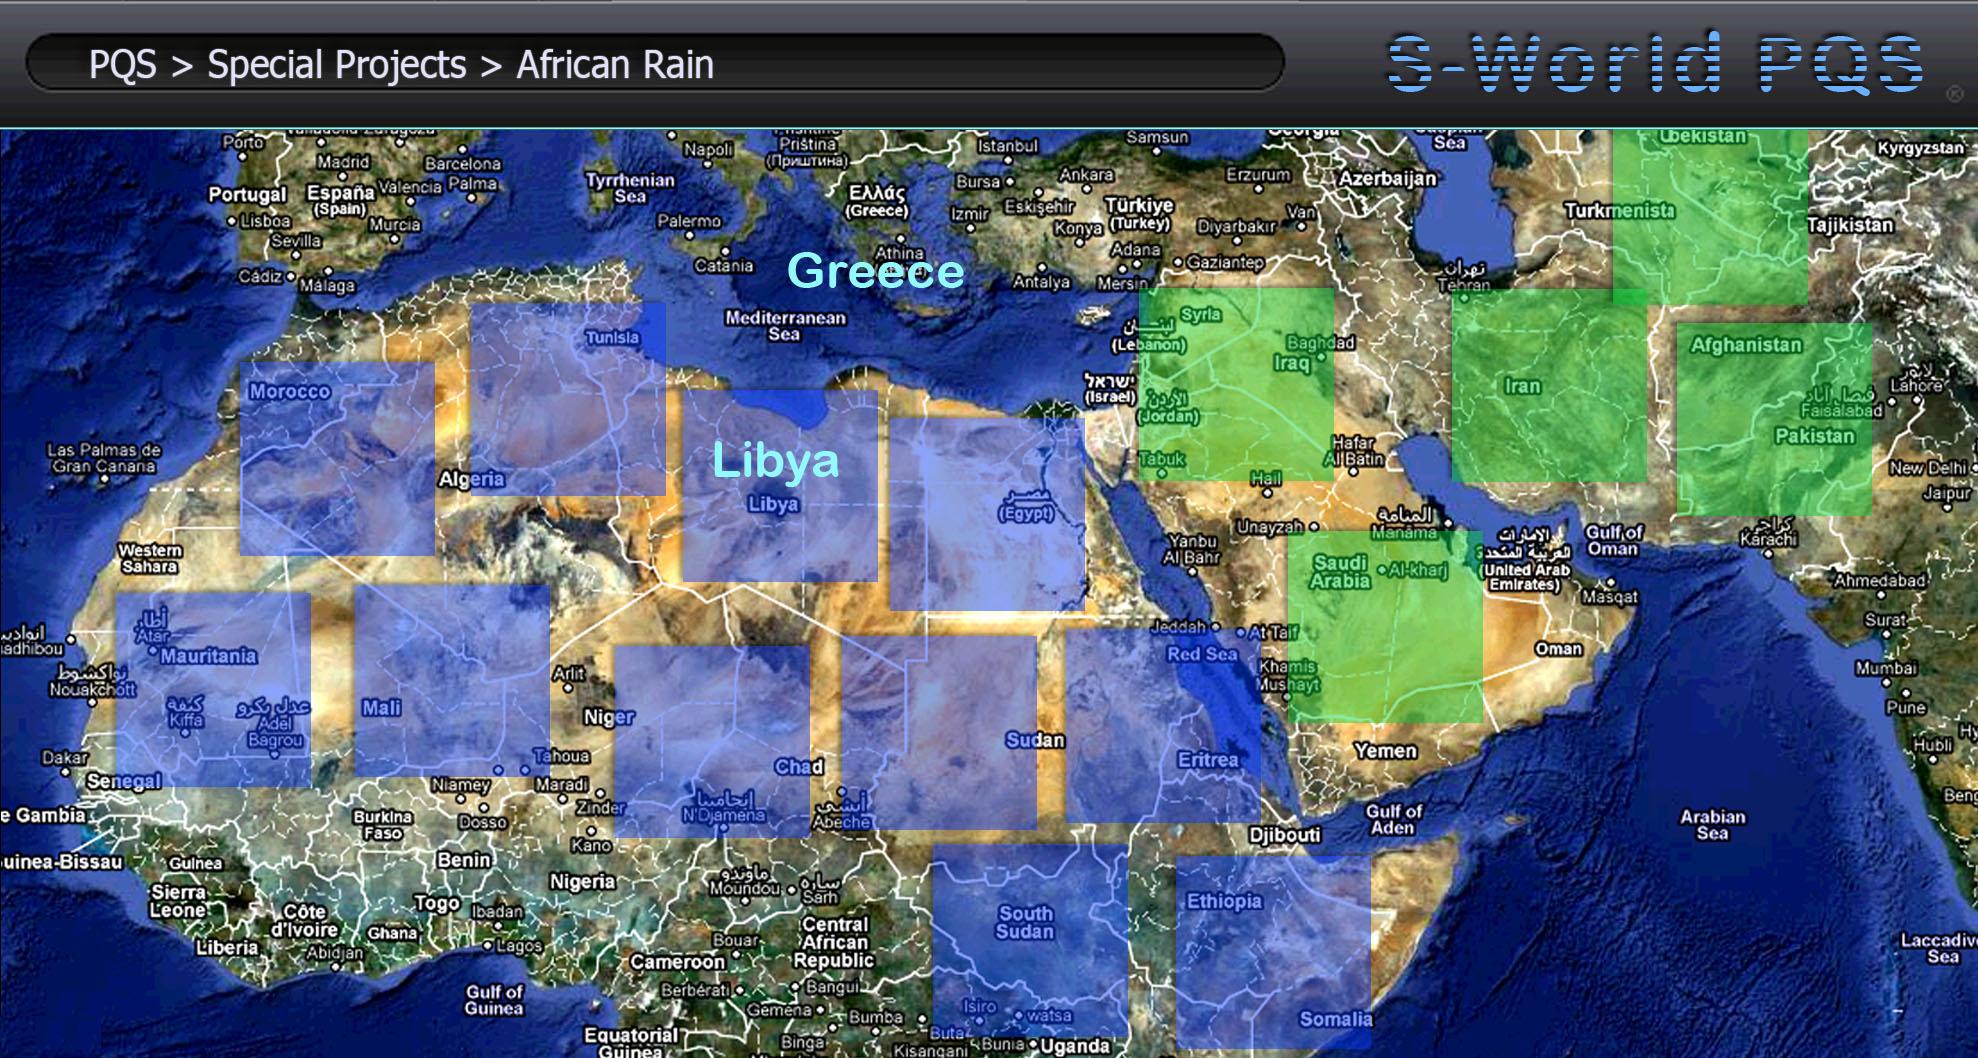 pqs-african-rain